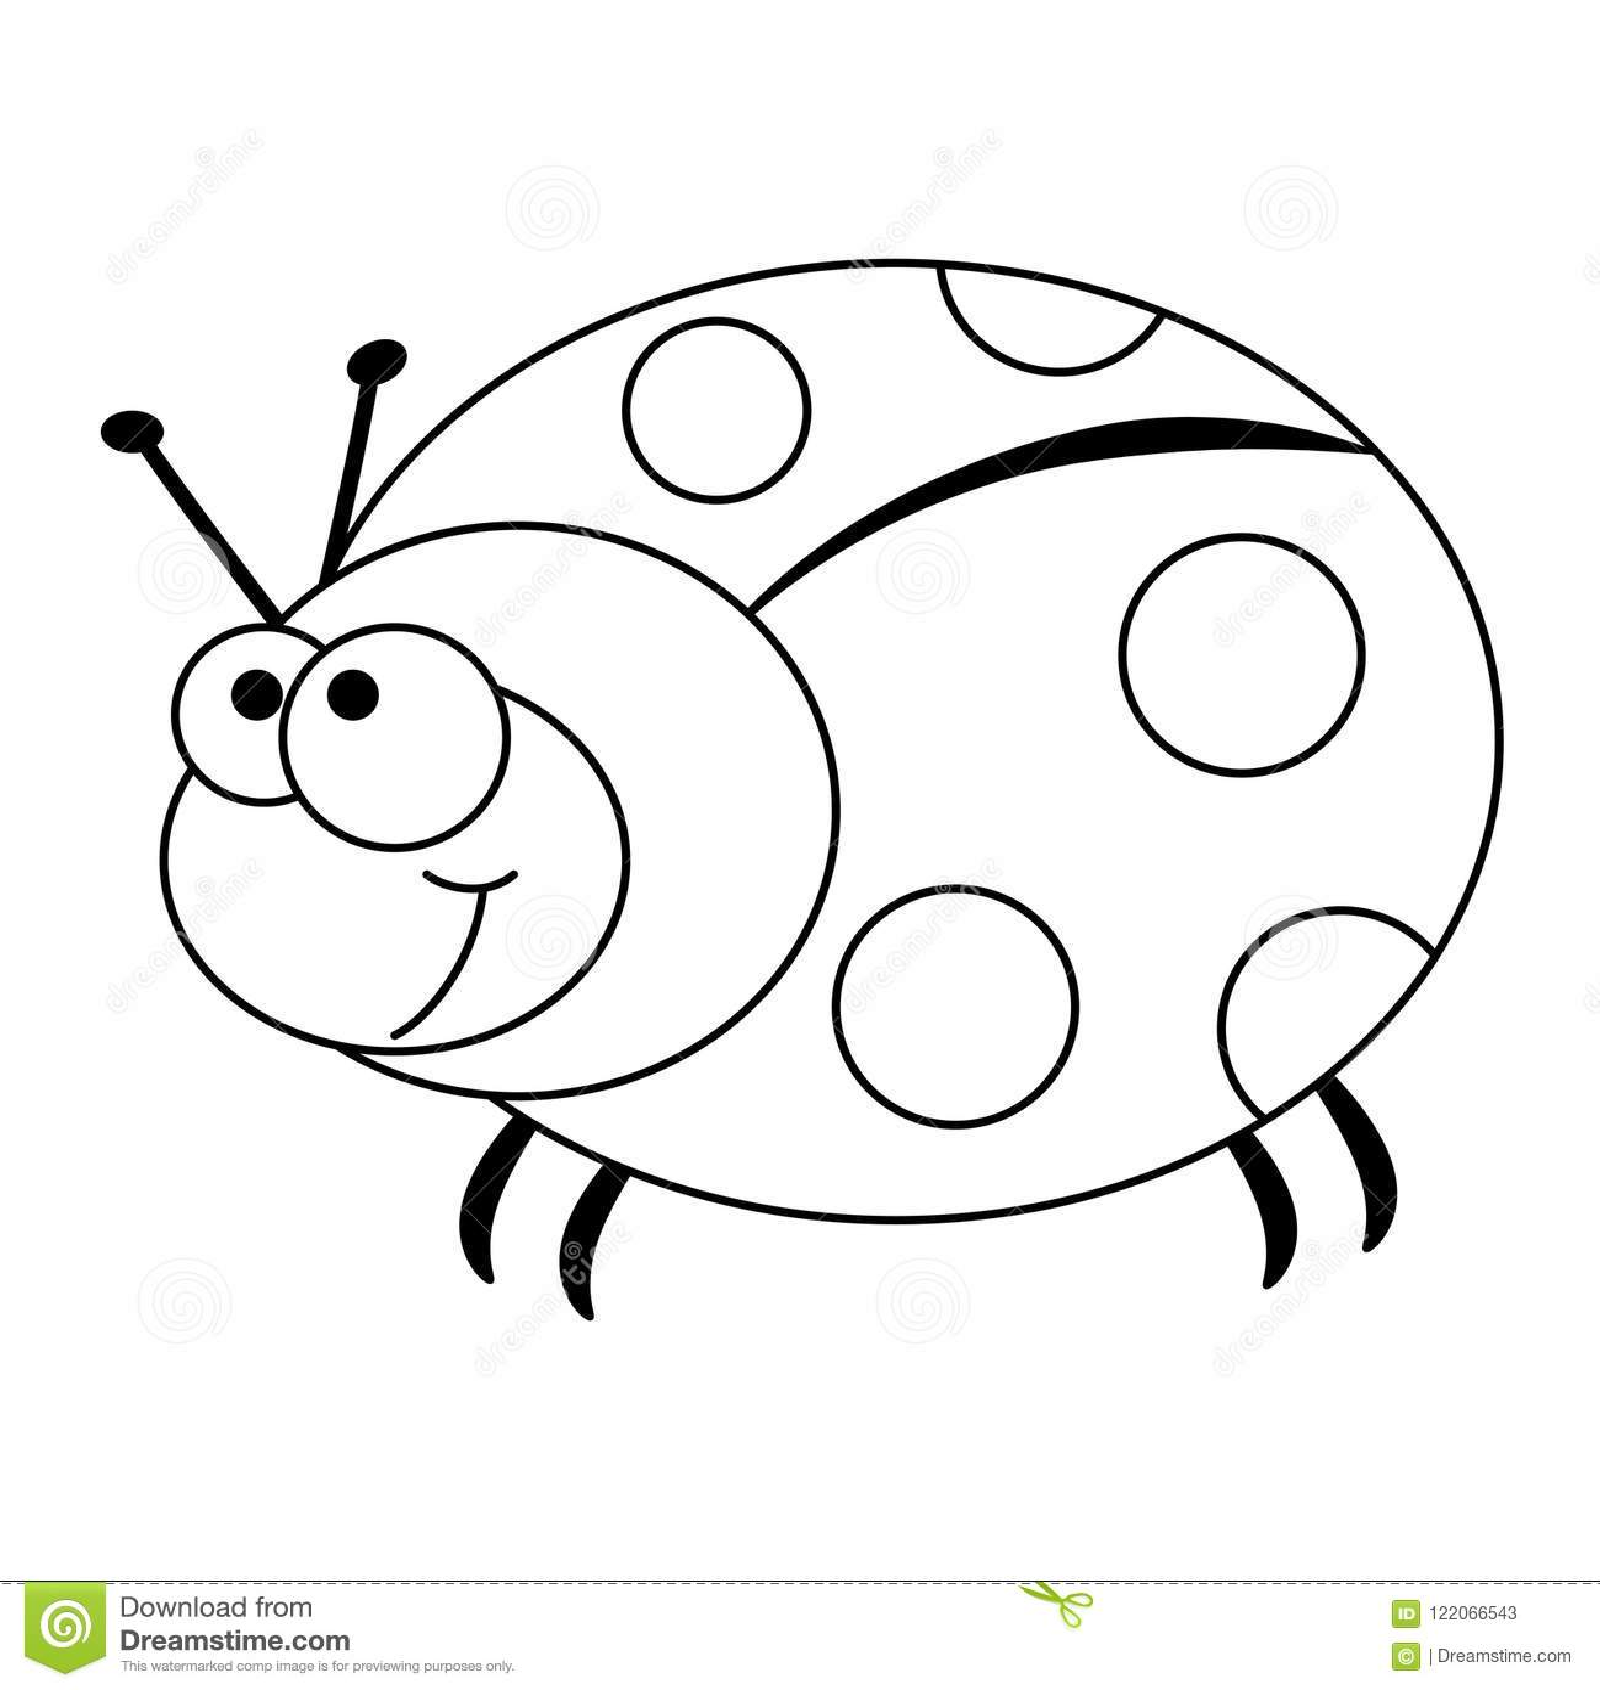 Colorless Funny Cartoon Ladybug Stock Vector Illustration Of Life